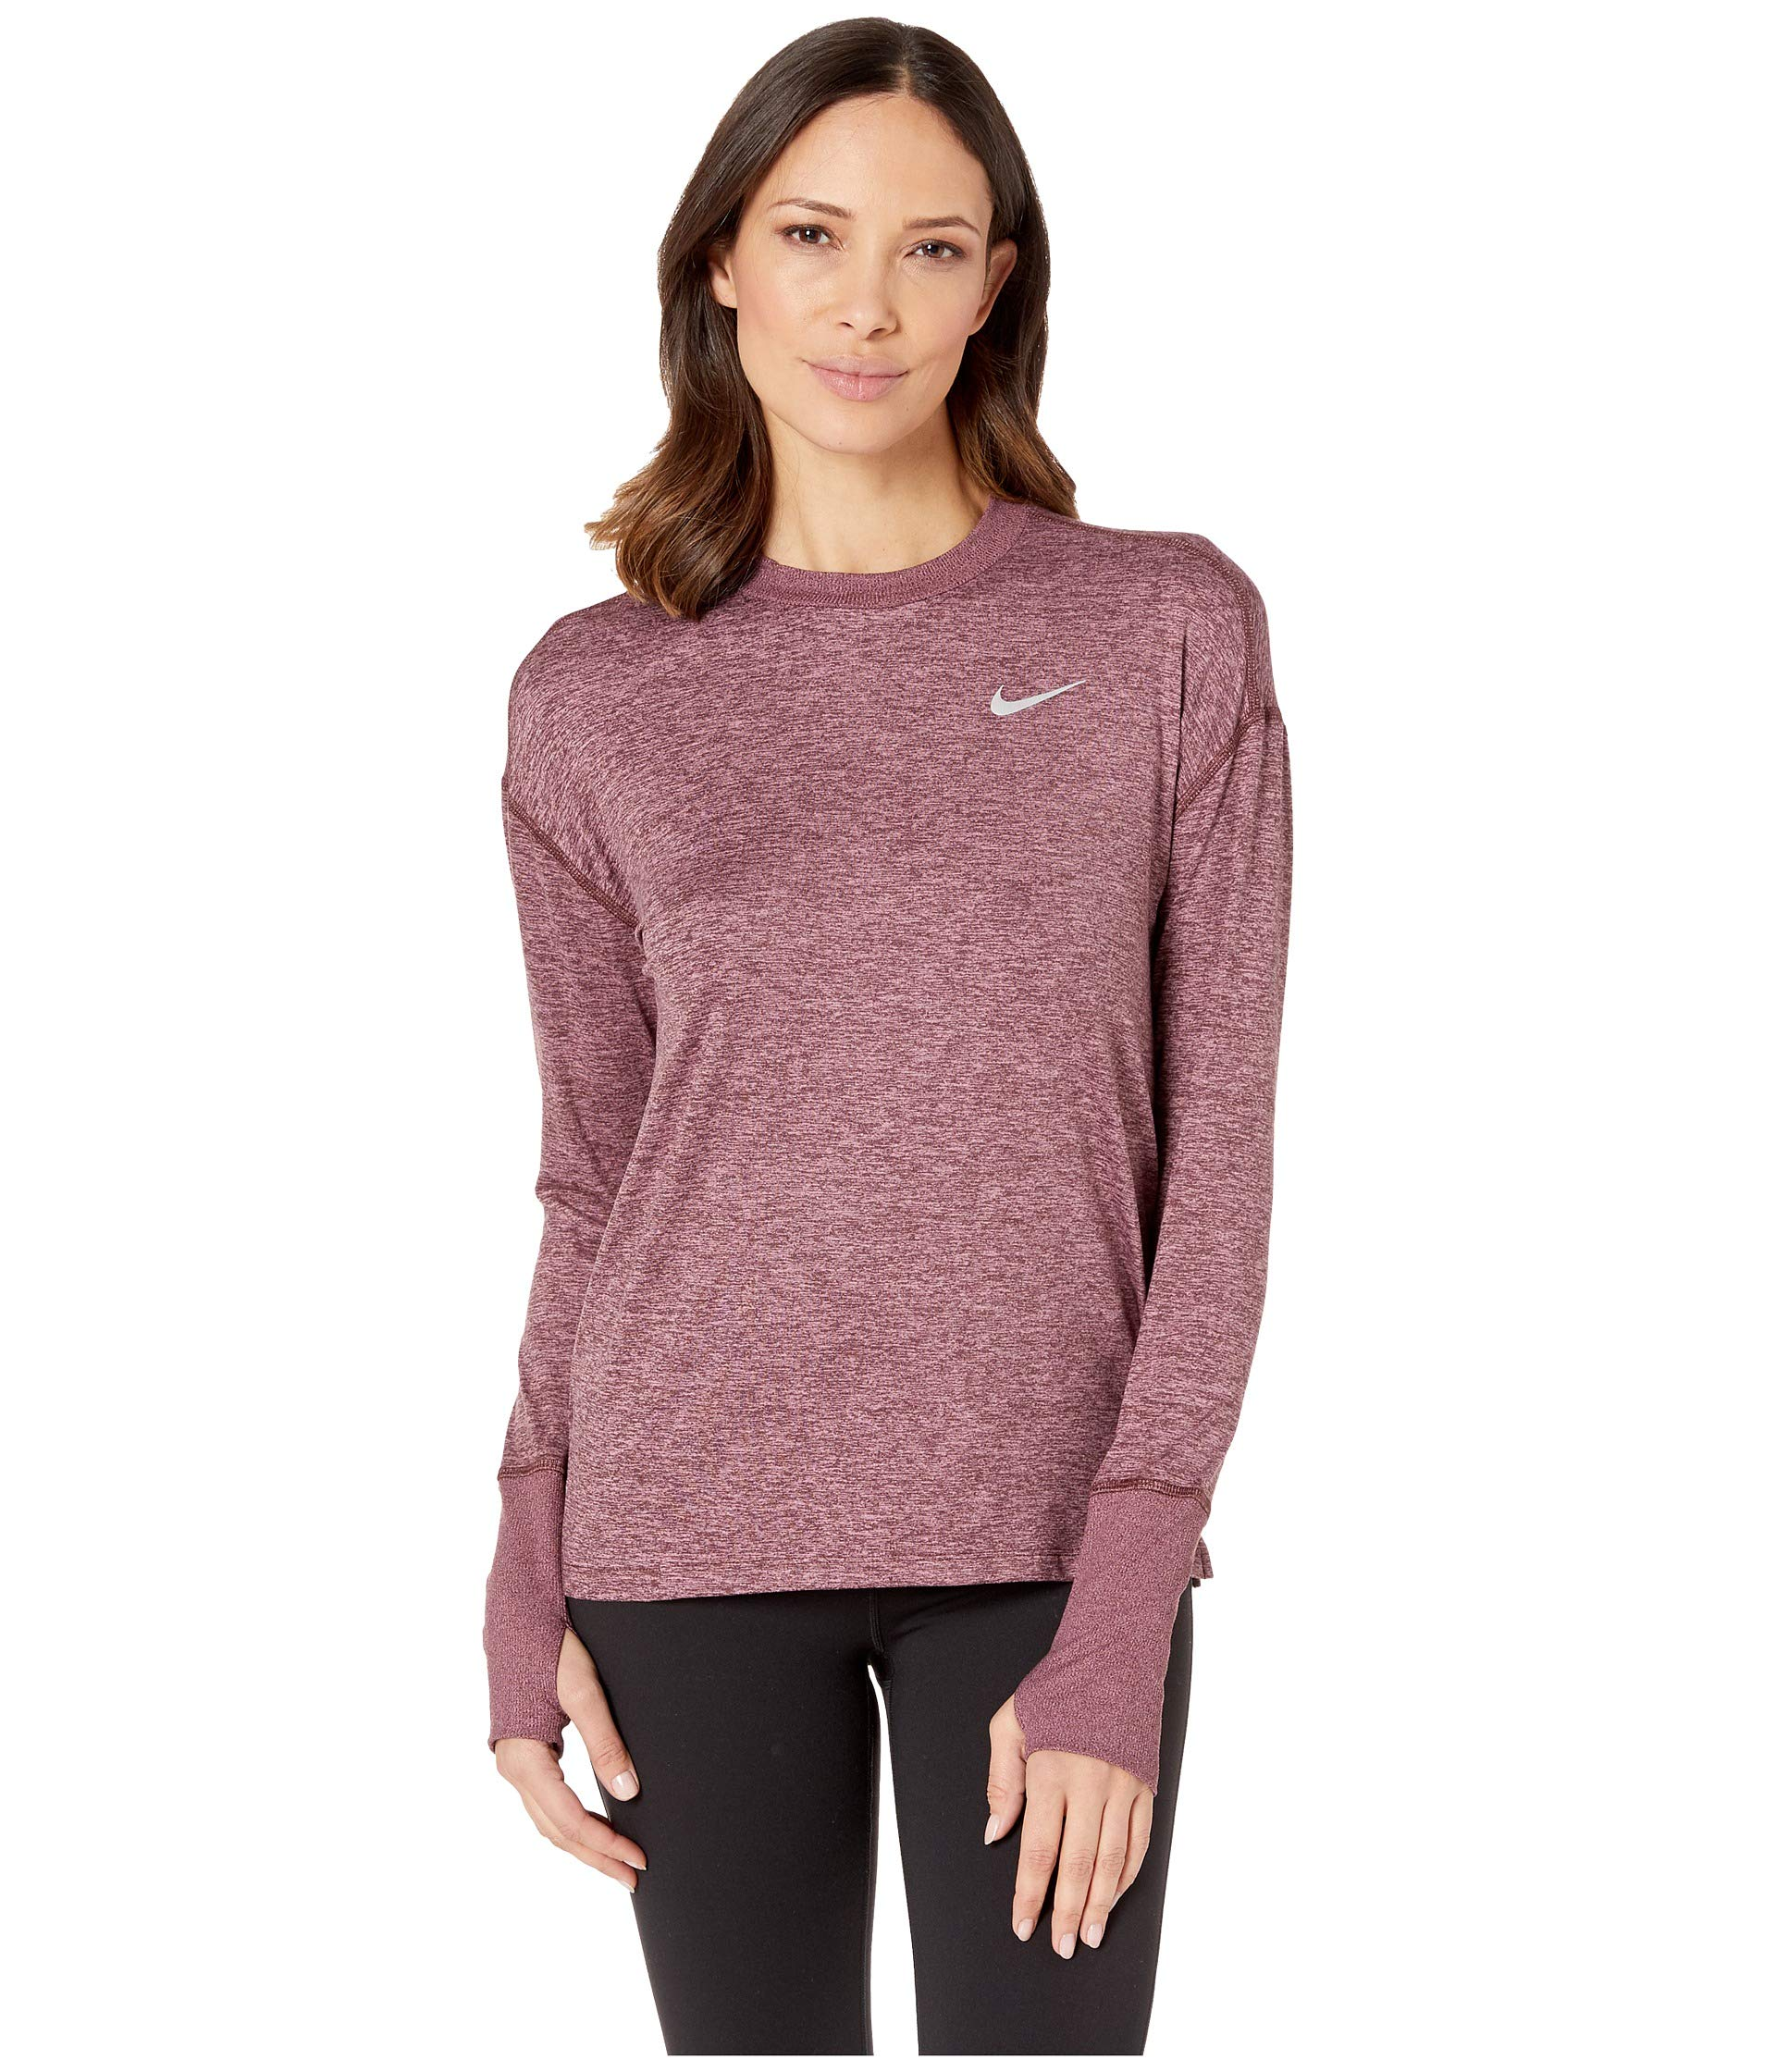 Nike Women's Element Long Sleeve Running Shirt (El Dorado/Plum Dust, X-Small)